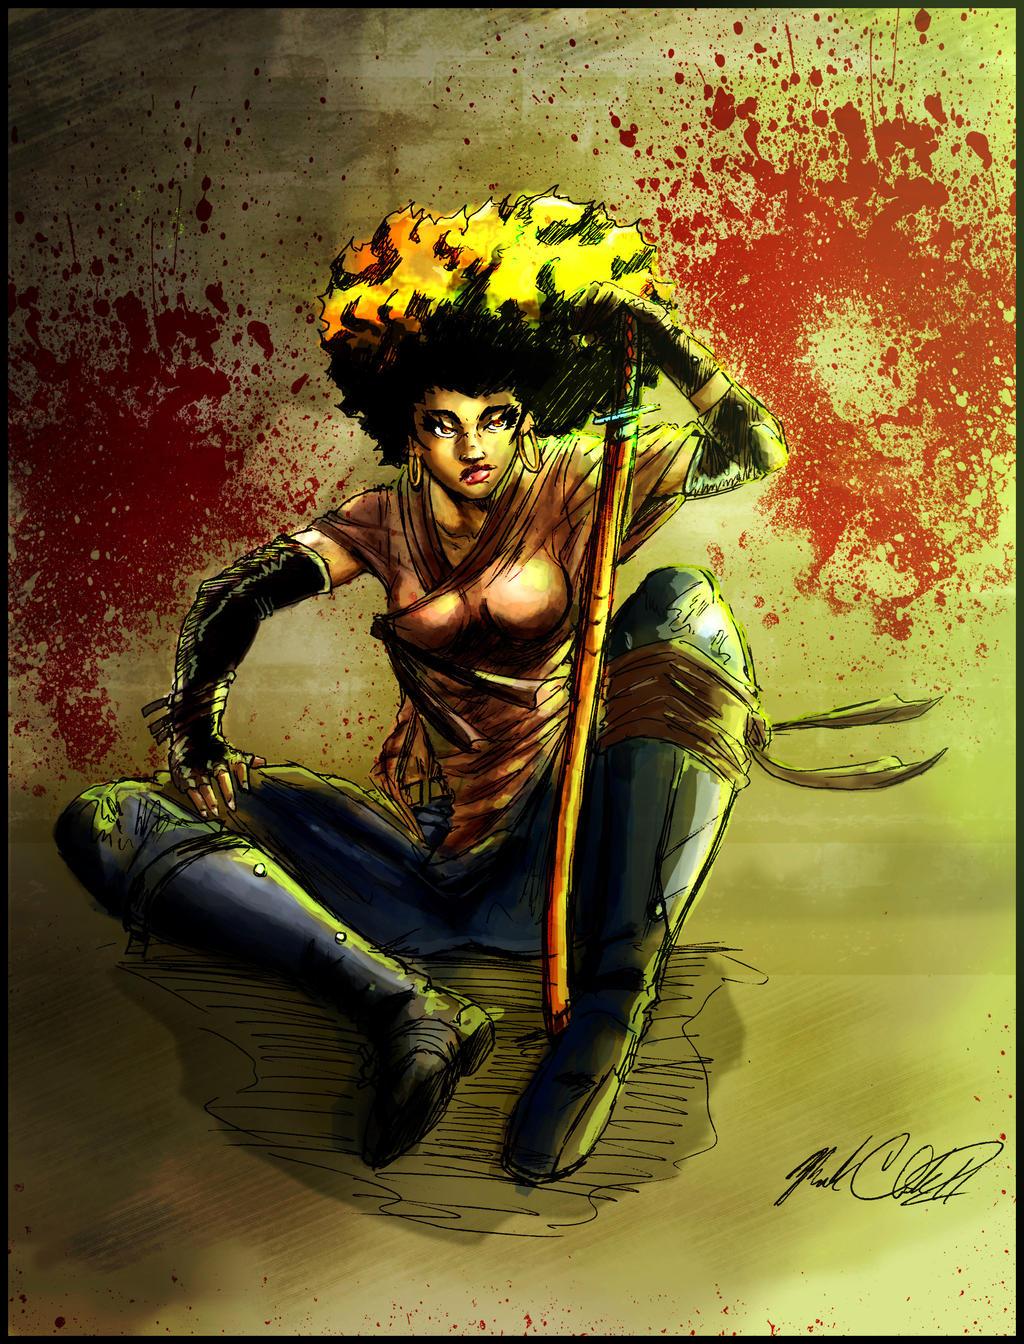 Ninja vixen by Mark-Clark-II